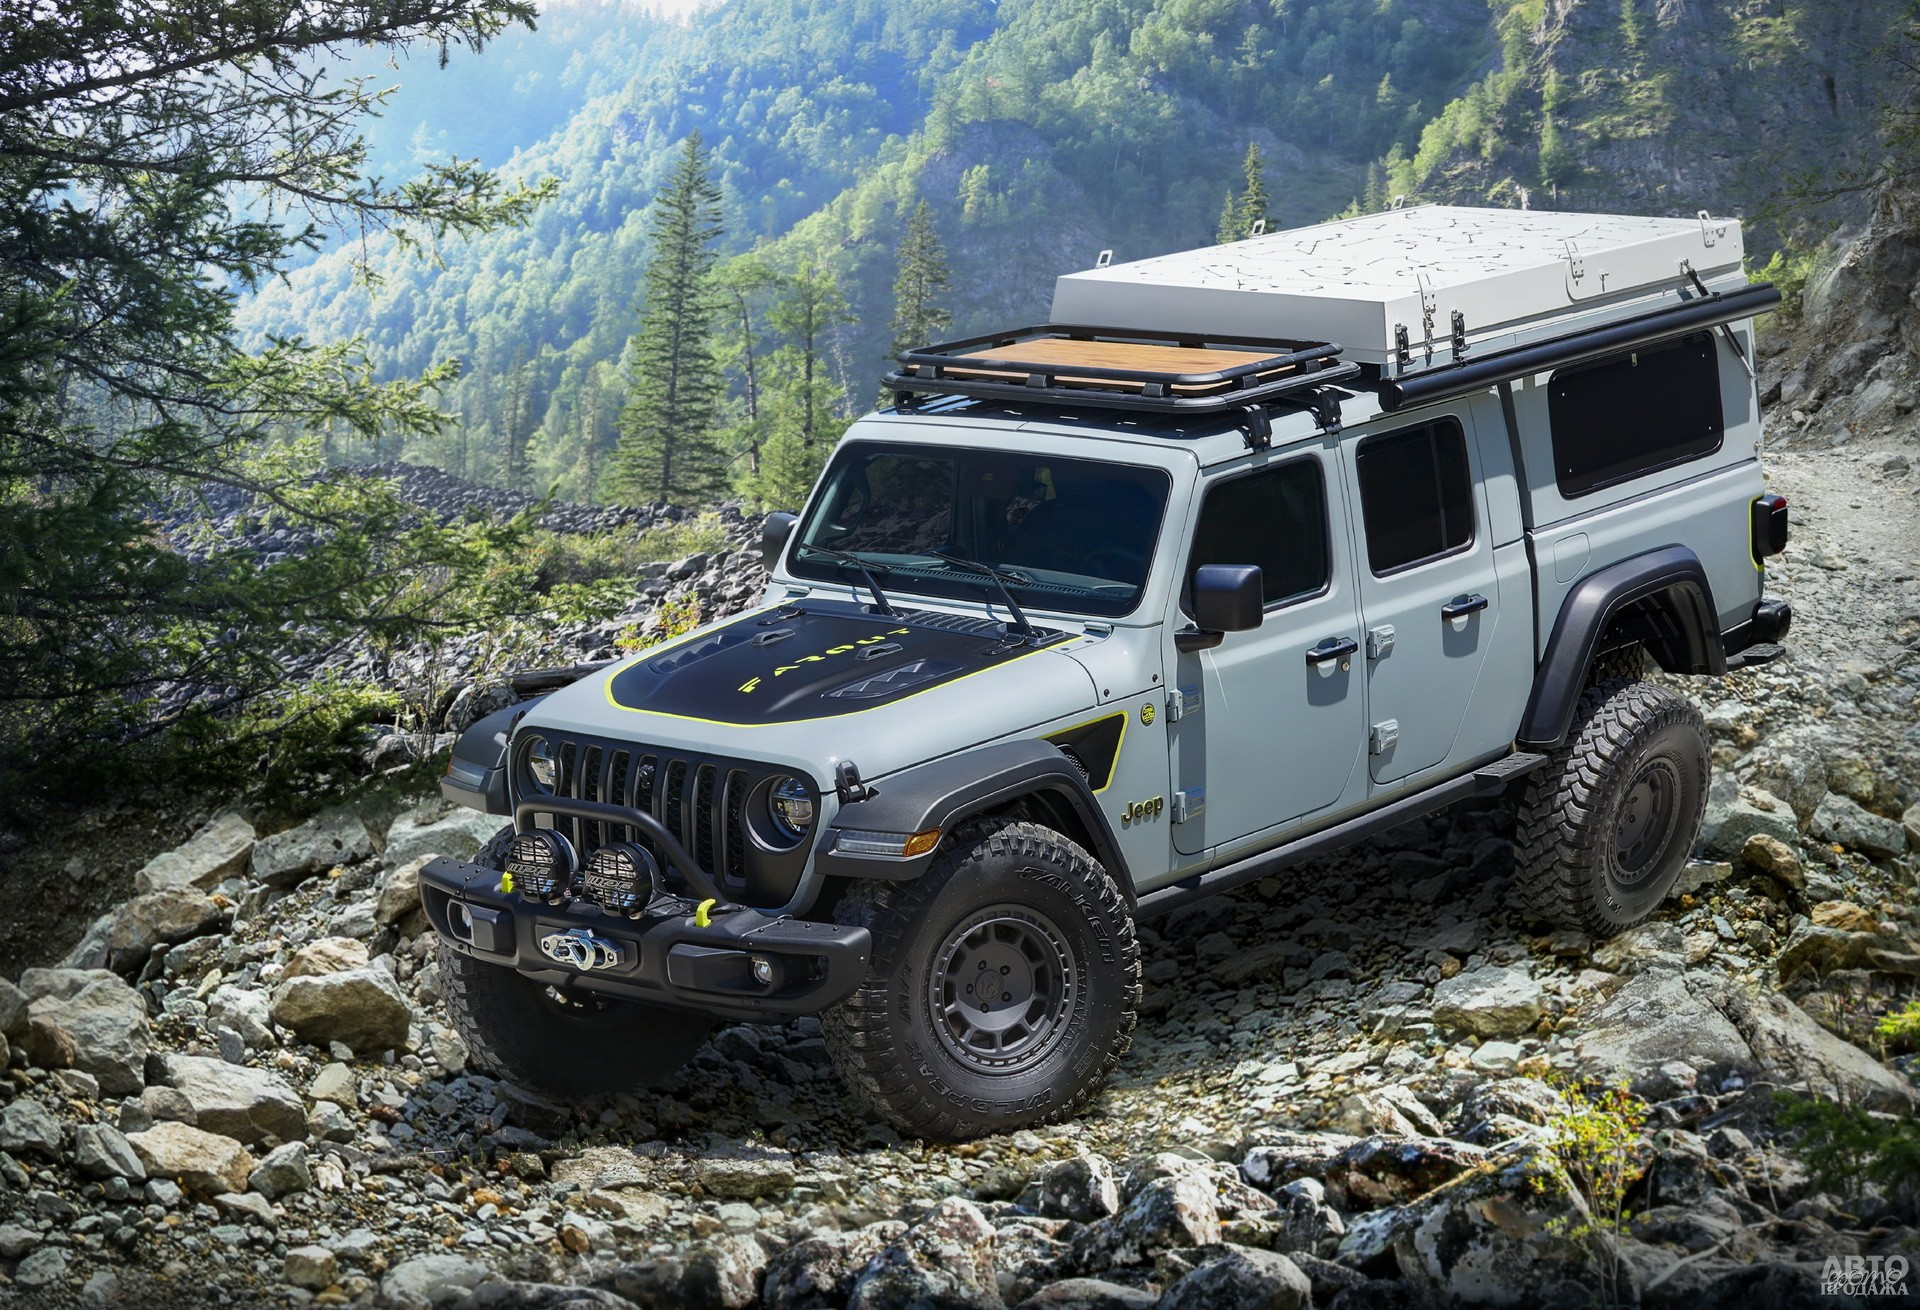 Jeep Gladiator Farout